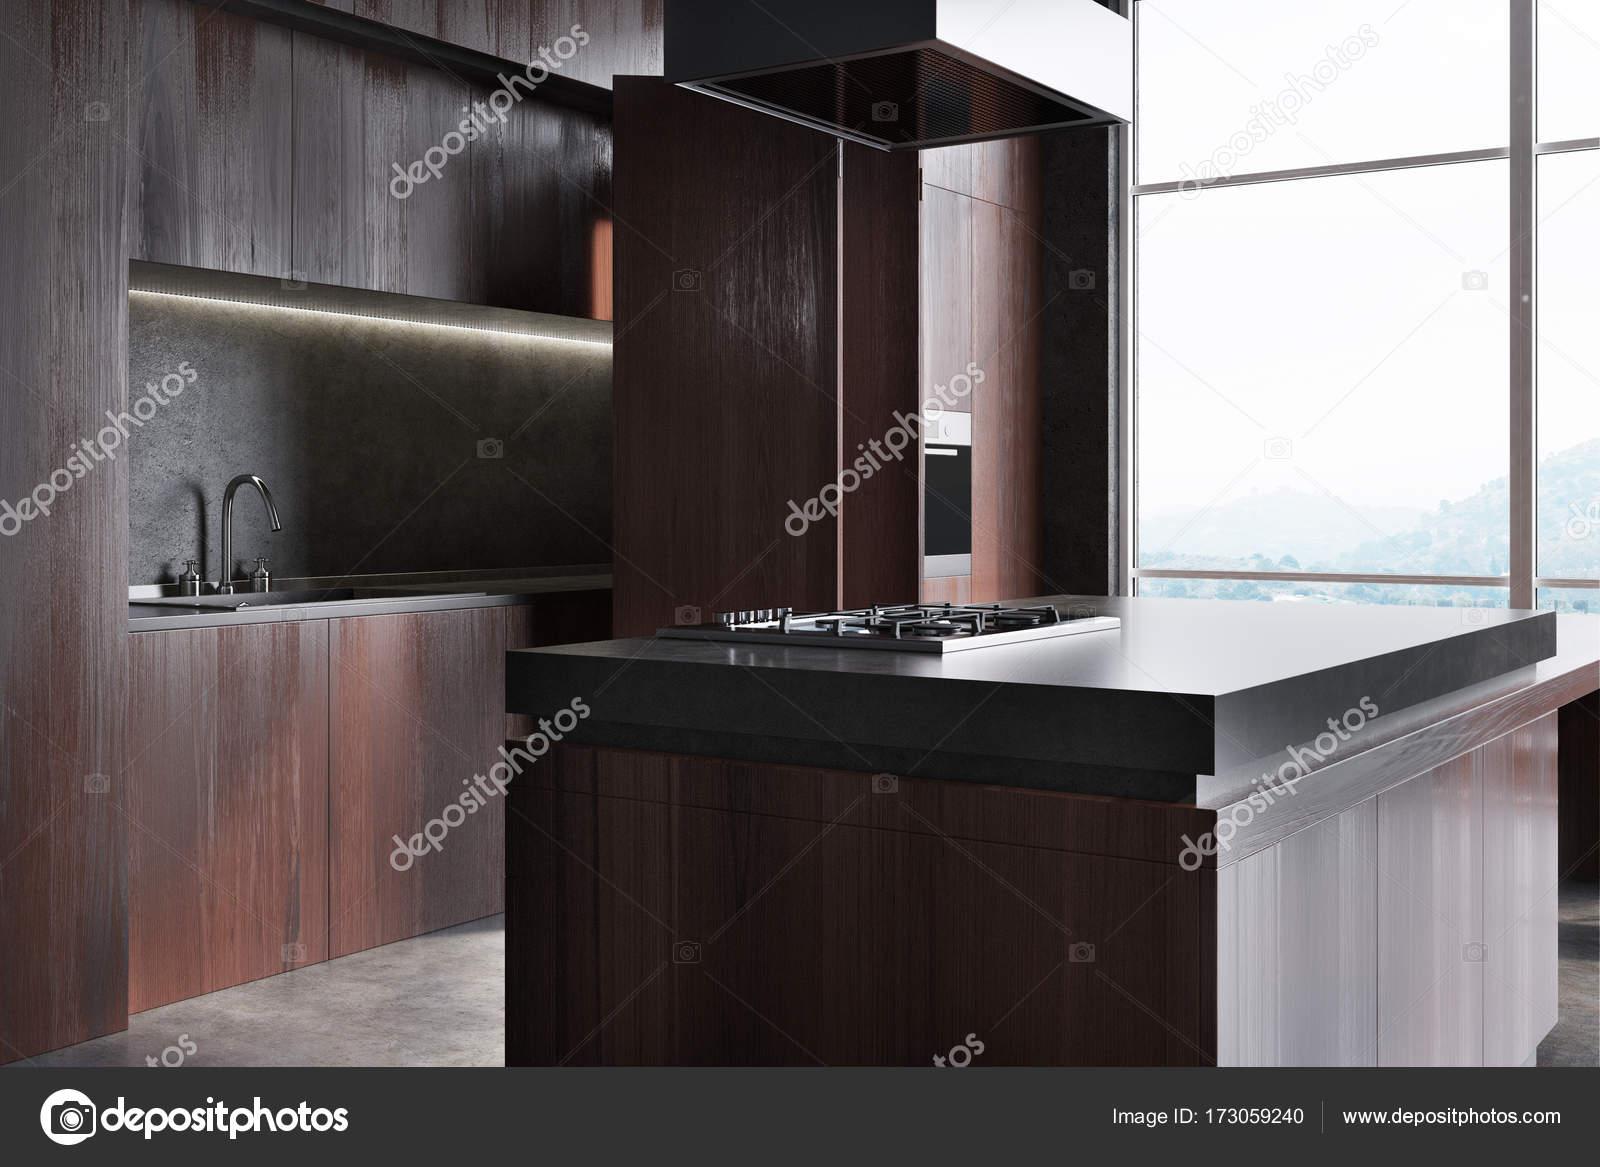 Dunkles Holz Und Marmor Küchenarbeitsplatte Hautnah Stockfoto